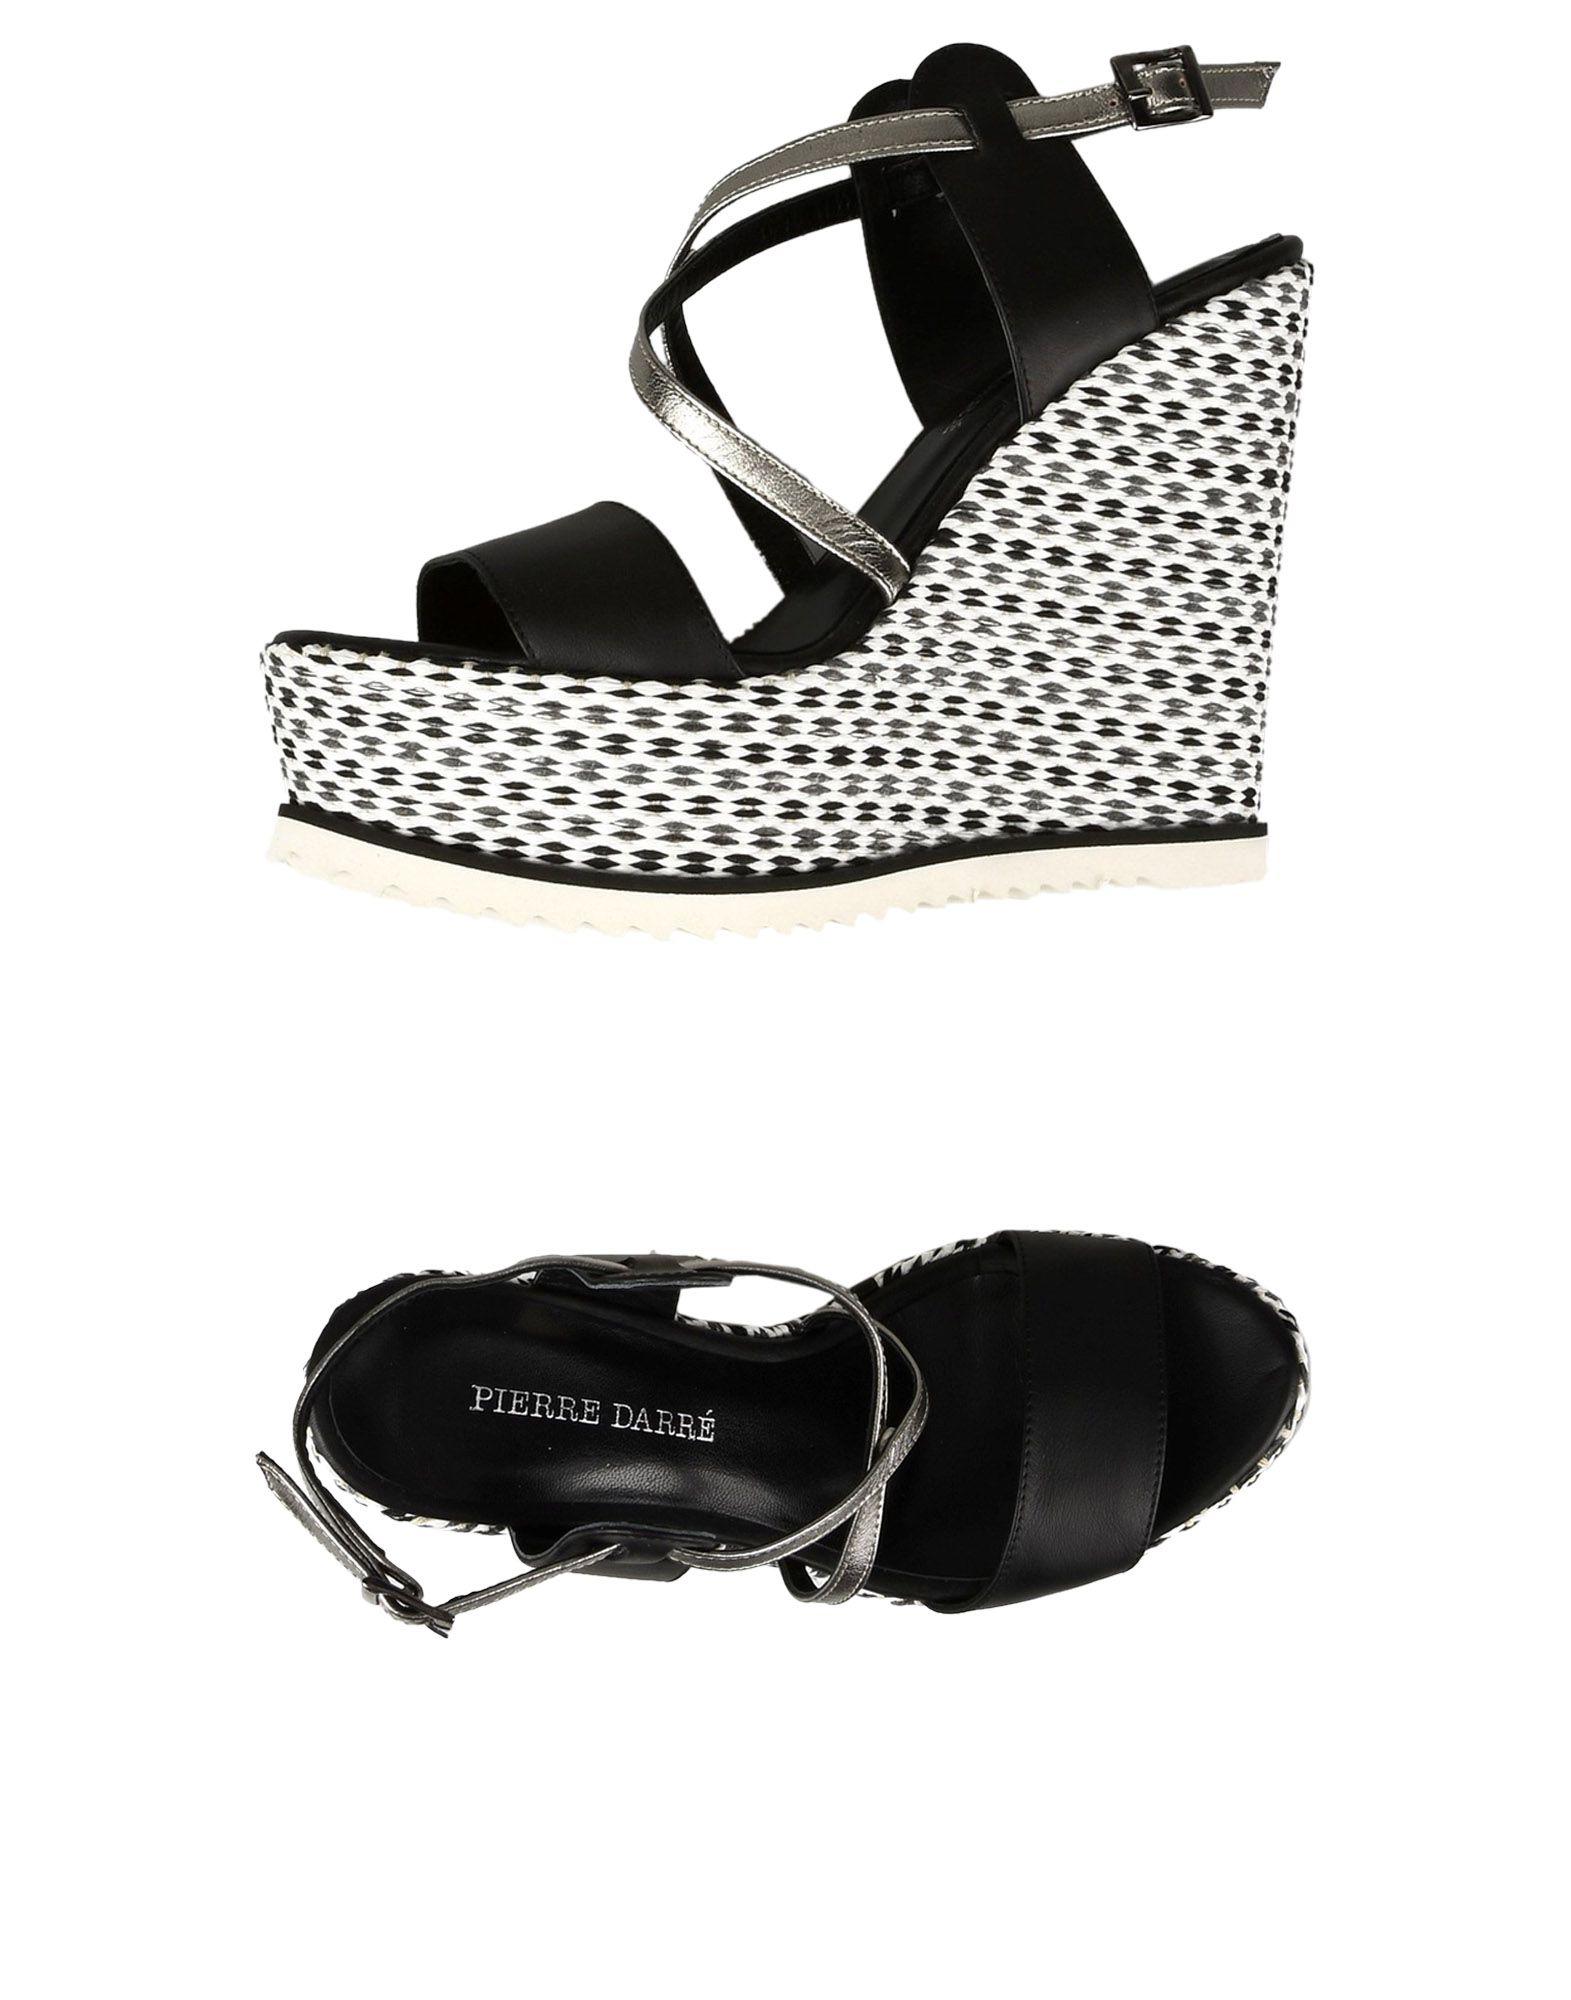 Pierre Darré Sandalen Damen  11240445HH Gute Qualität beliebte Schuhe